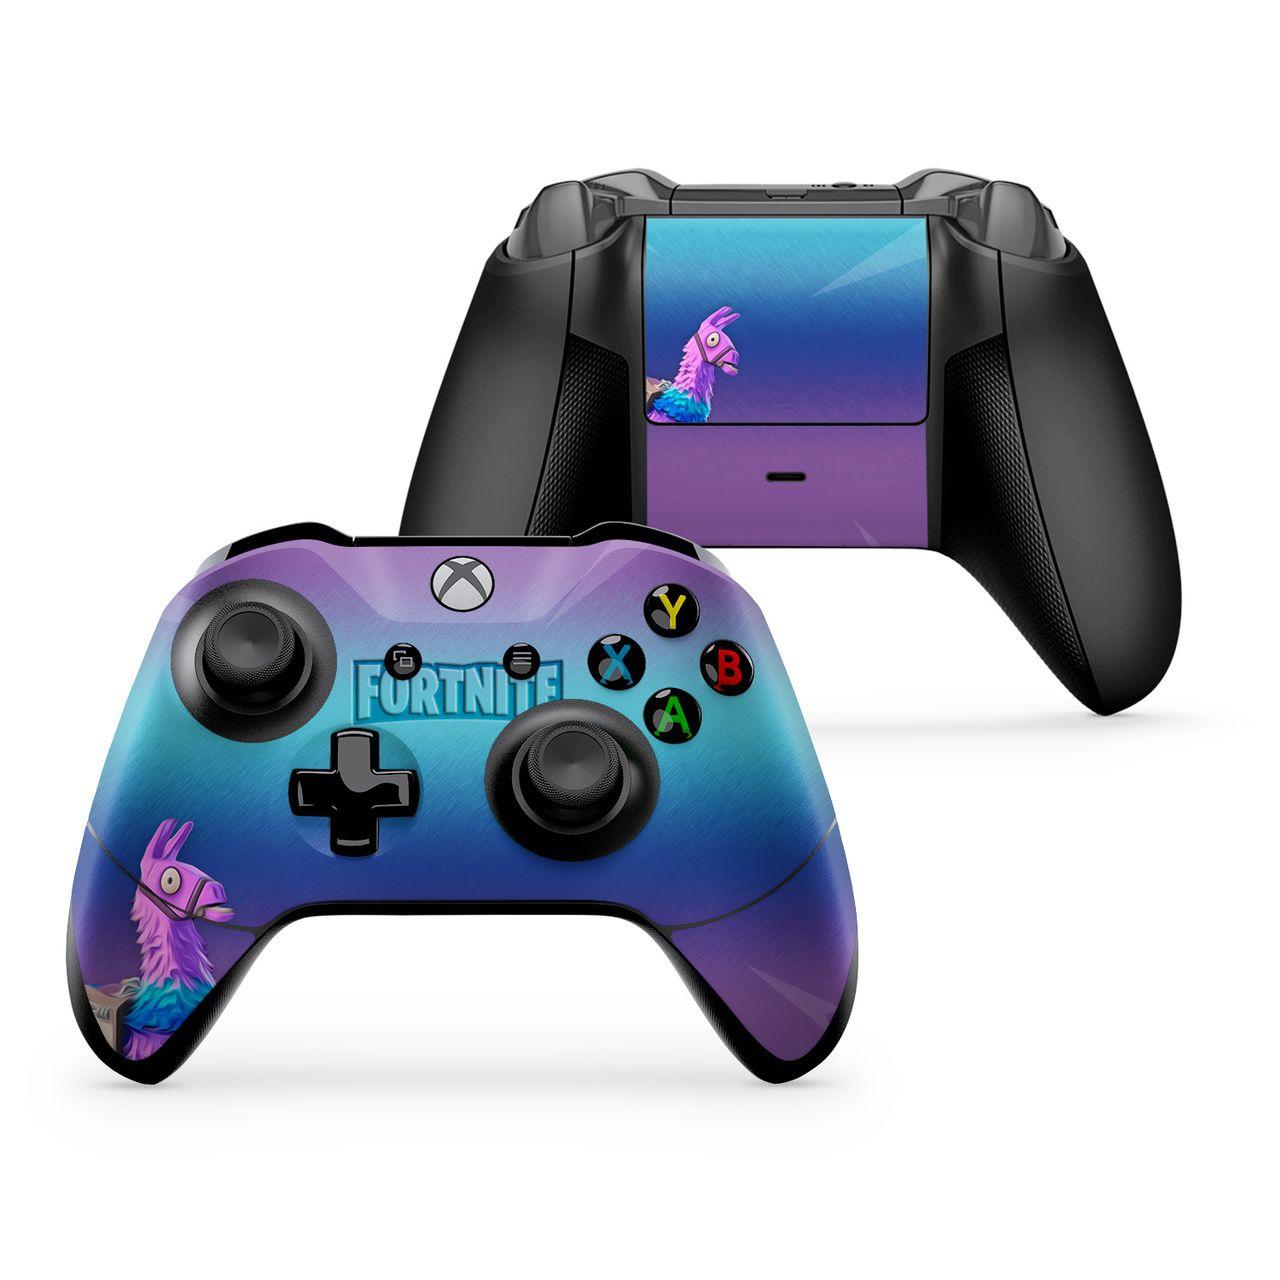 Loot Llama Xbox One X S Controller Skin Custom Xbox One Controller Xbox One Controller Custom Xbox